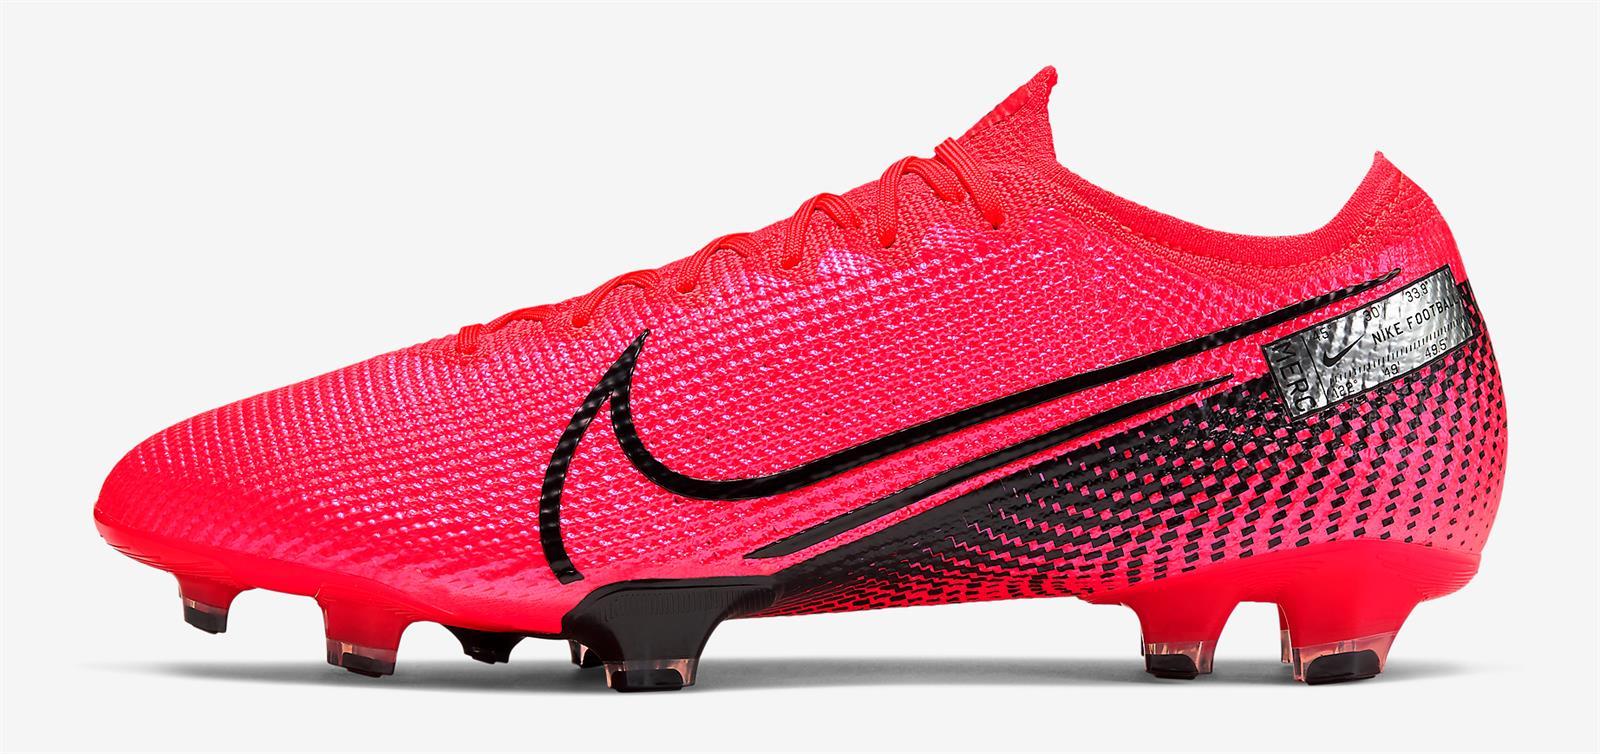 Giay da bong Nike Mercurial Vapor 13 Elite dep nhat (1)